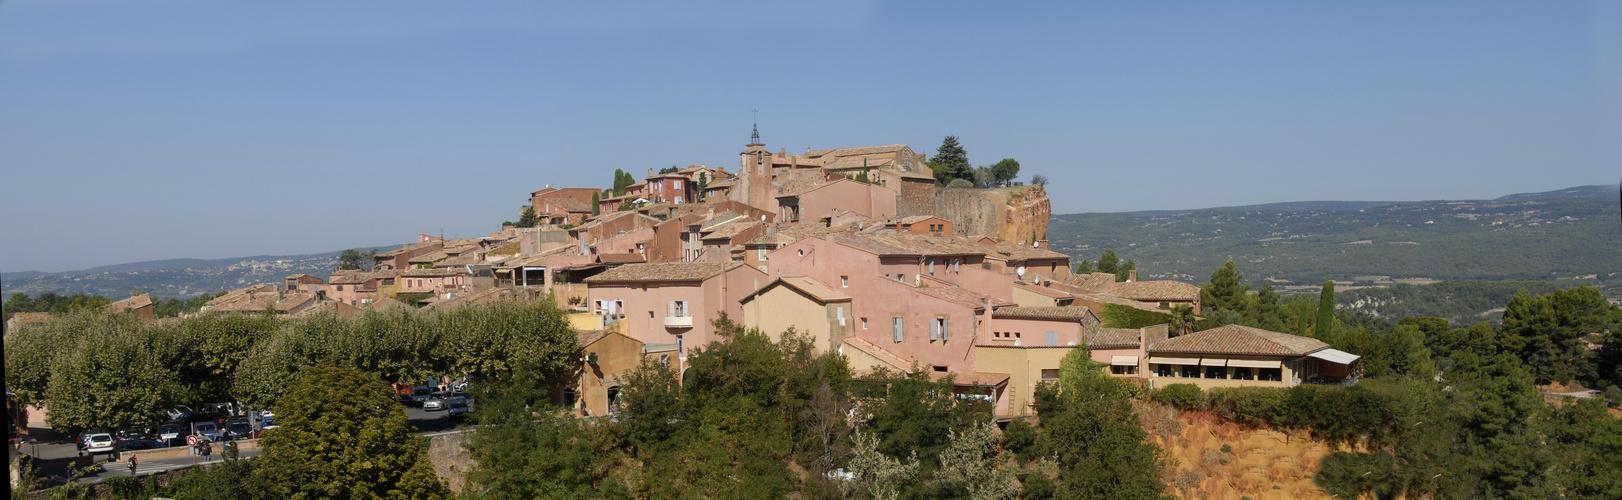 Roussillon panorama